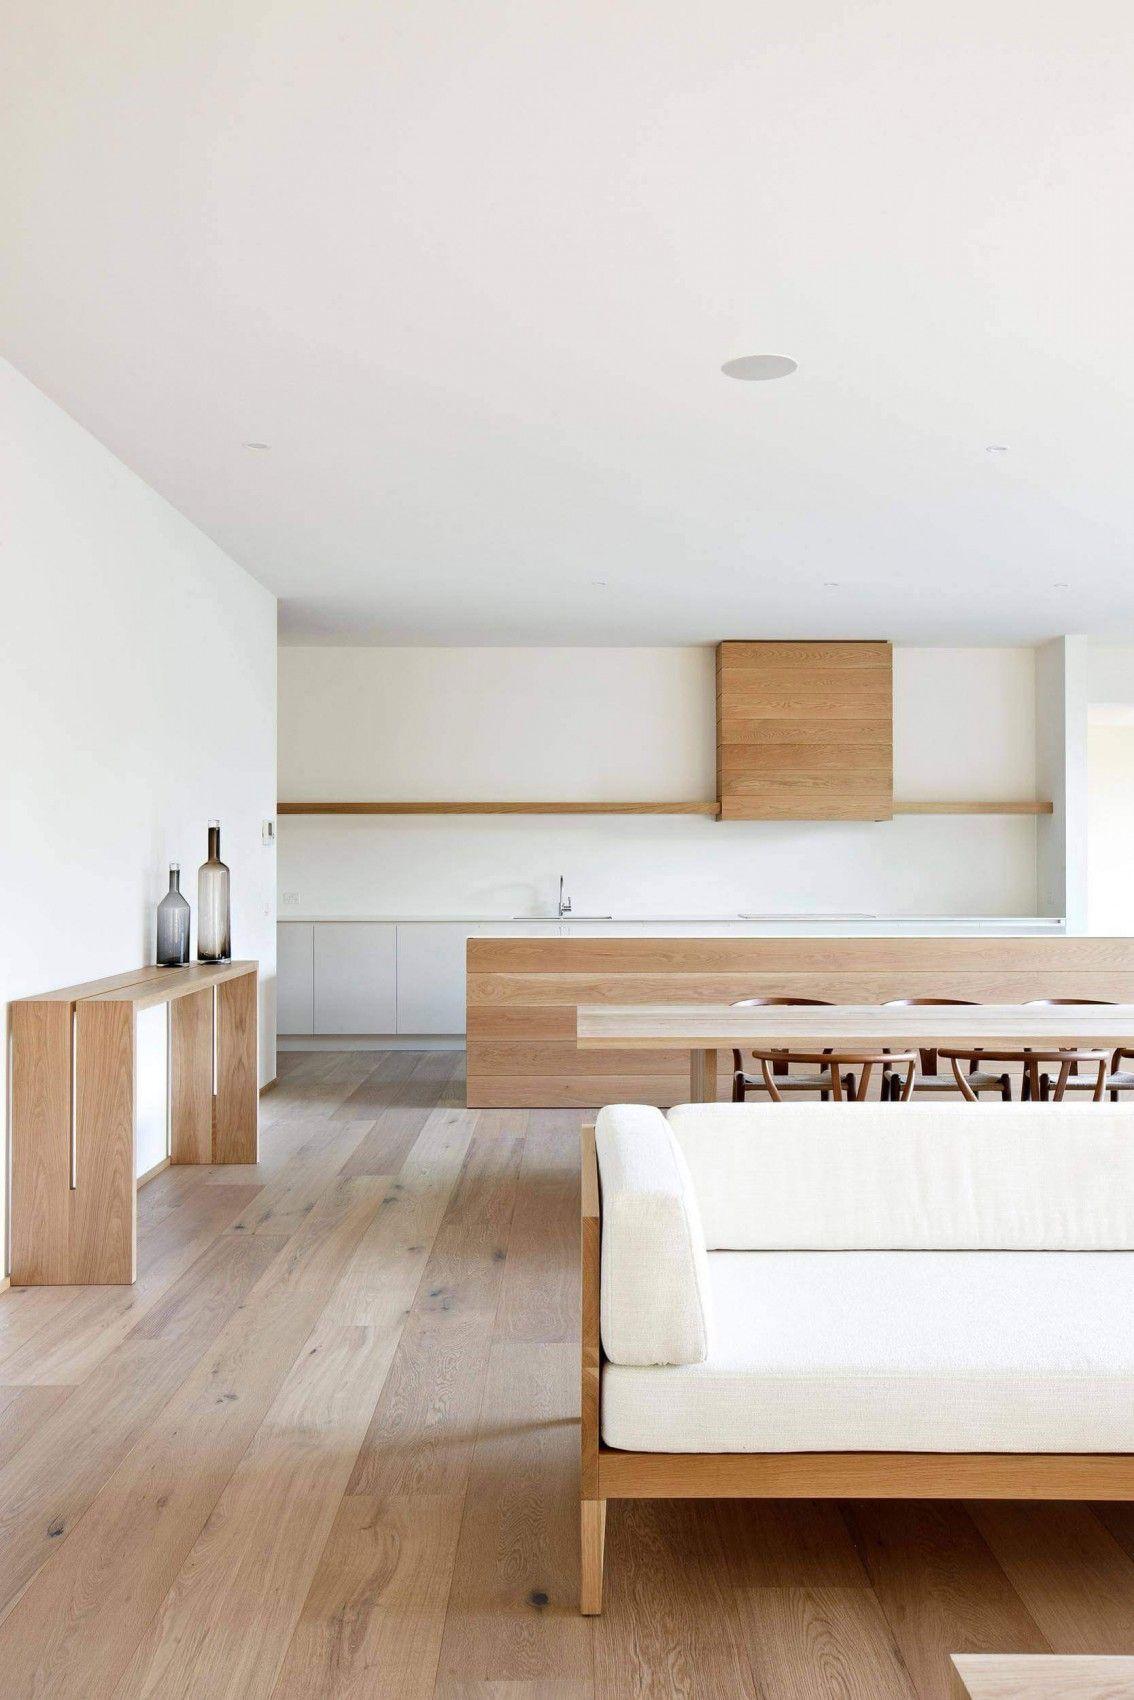 2019 的 11+ Excellent Minimalist Furniture Dreams Ideas 主题 | 现代